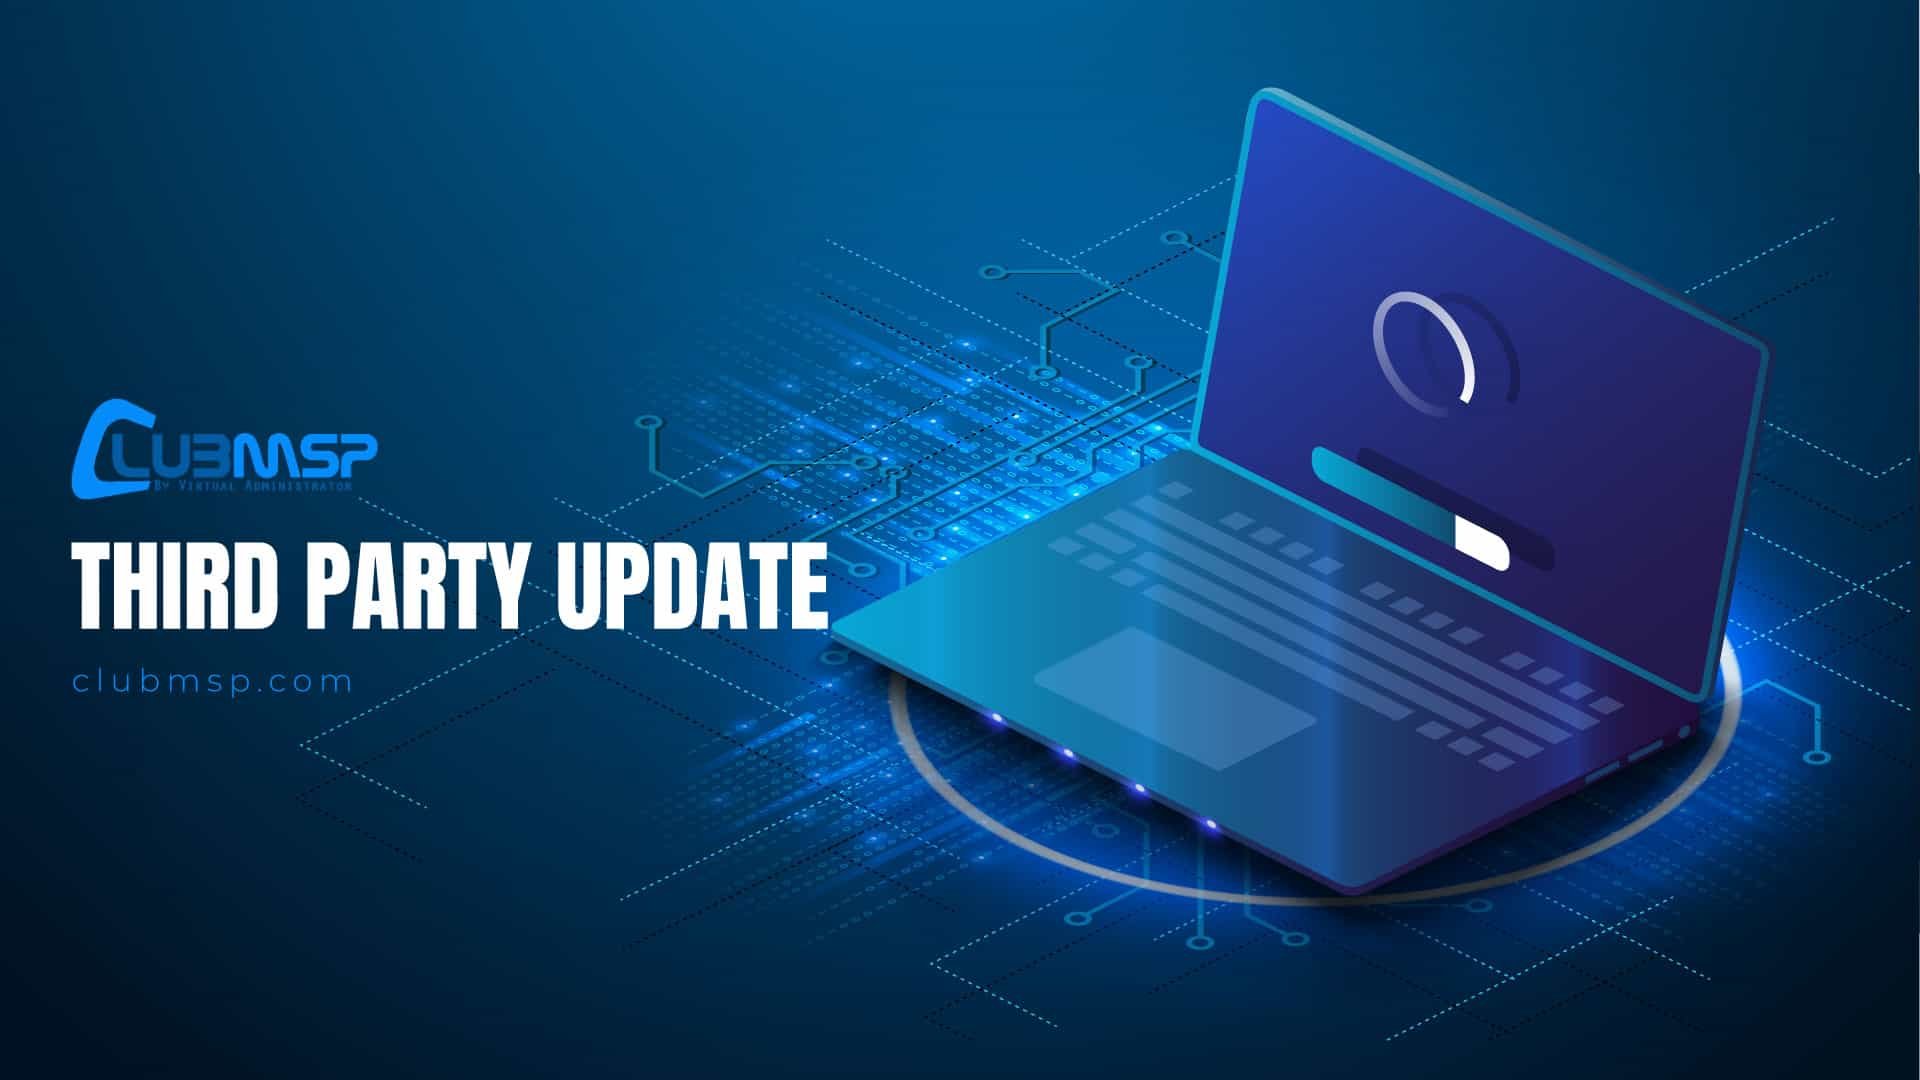 Third Party Update